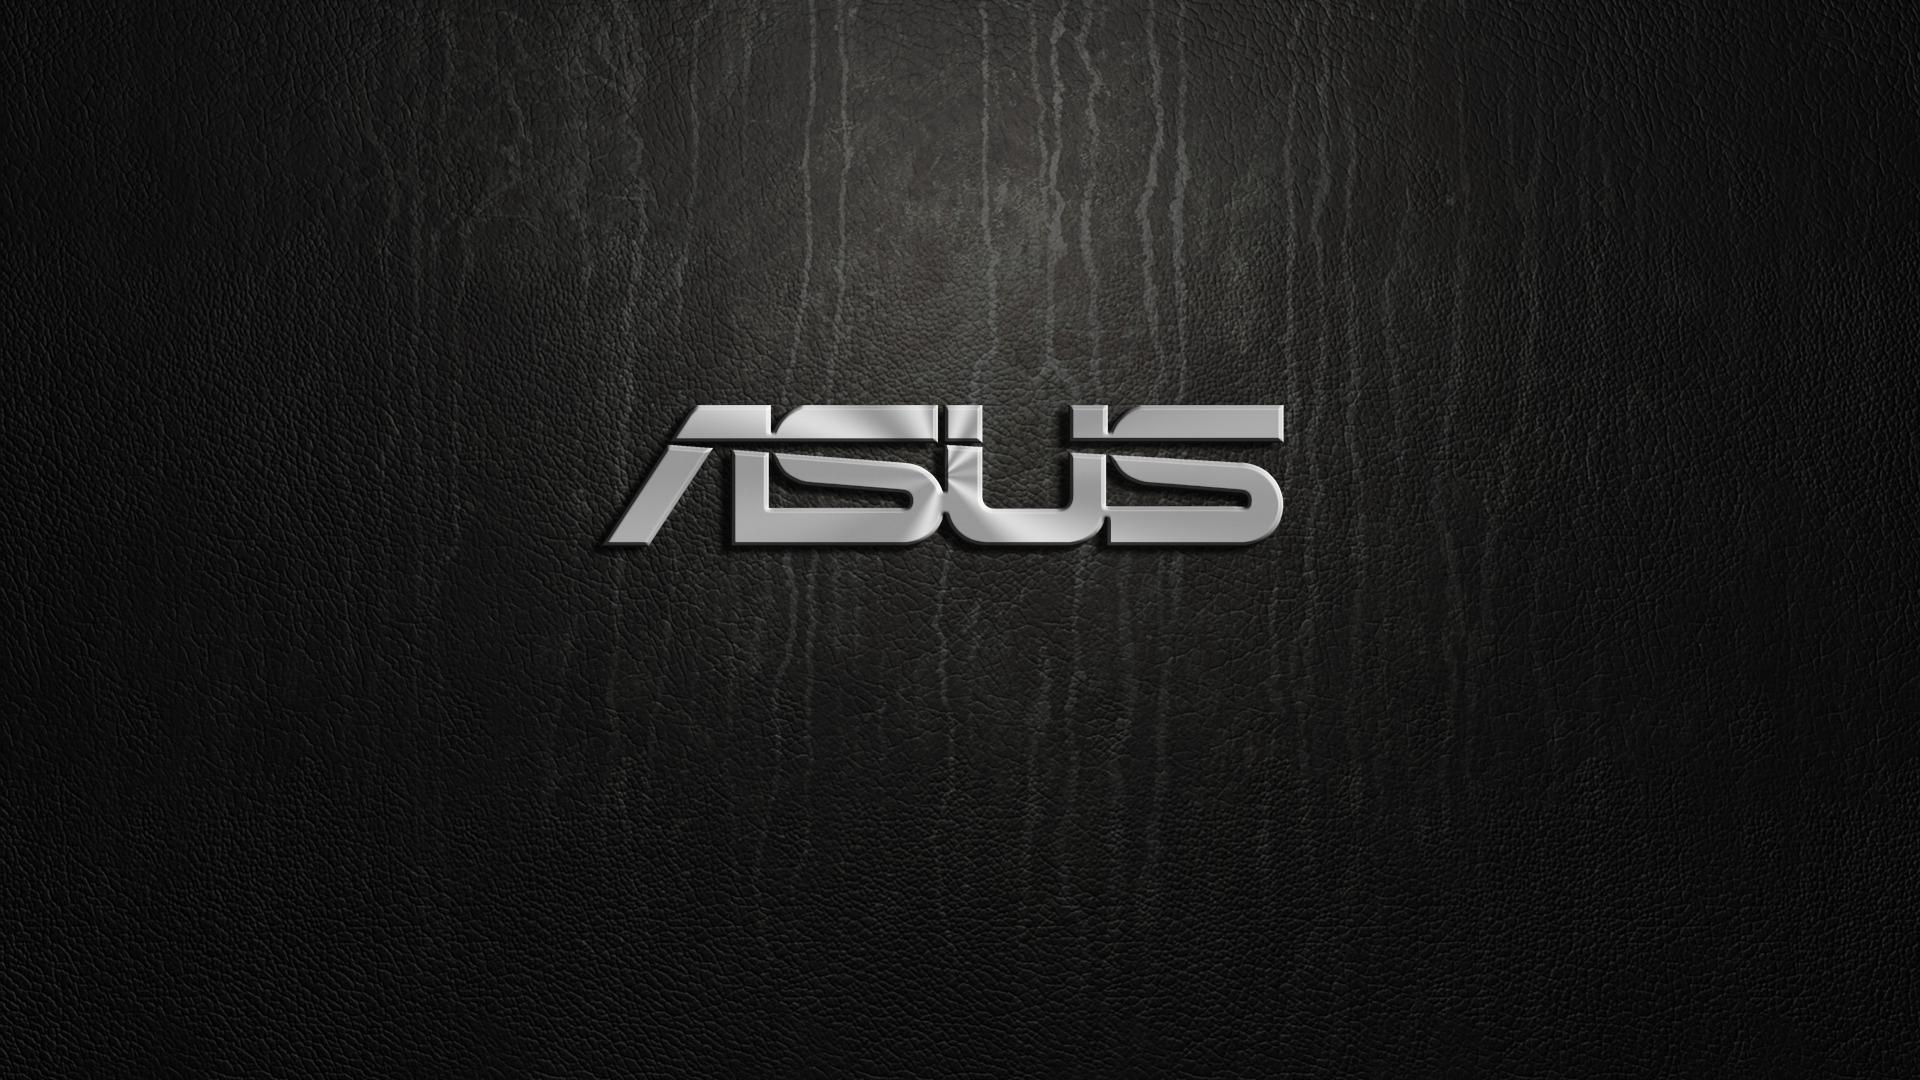 Group Of Asus Logos Wallpaper 1920x1080